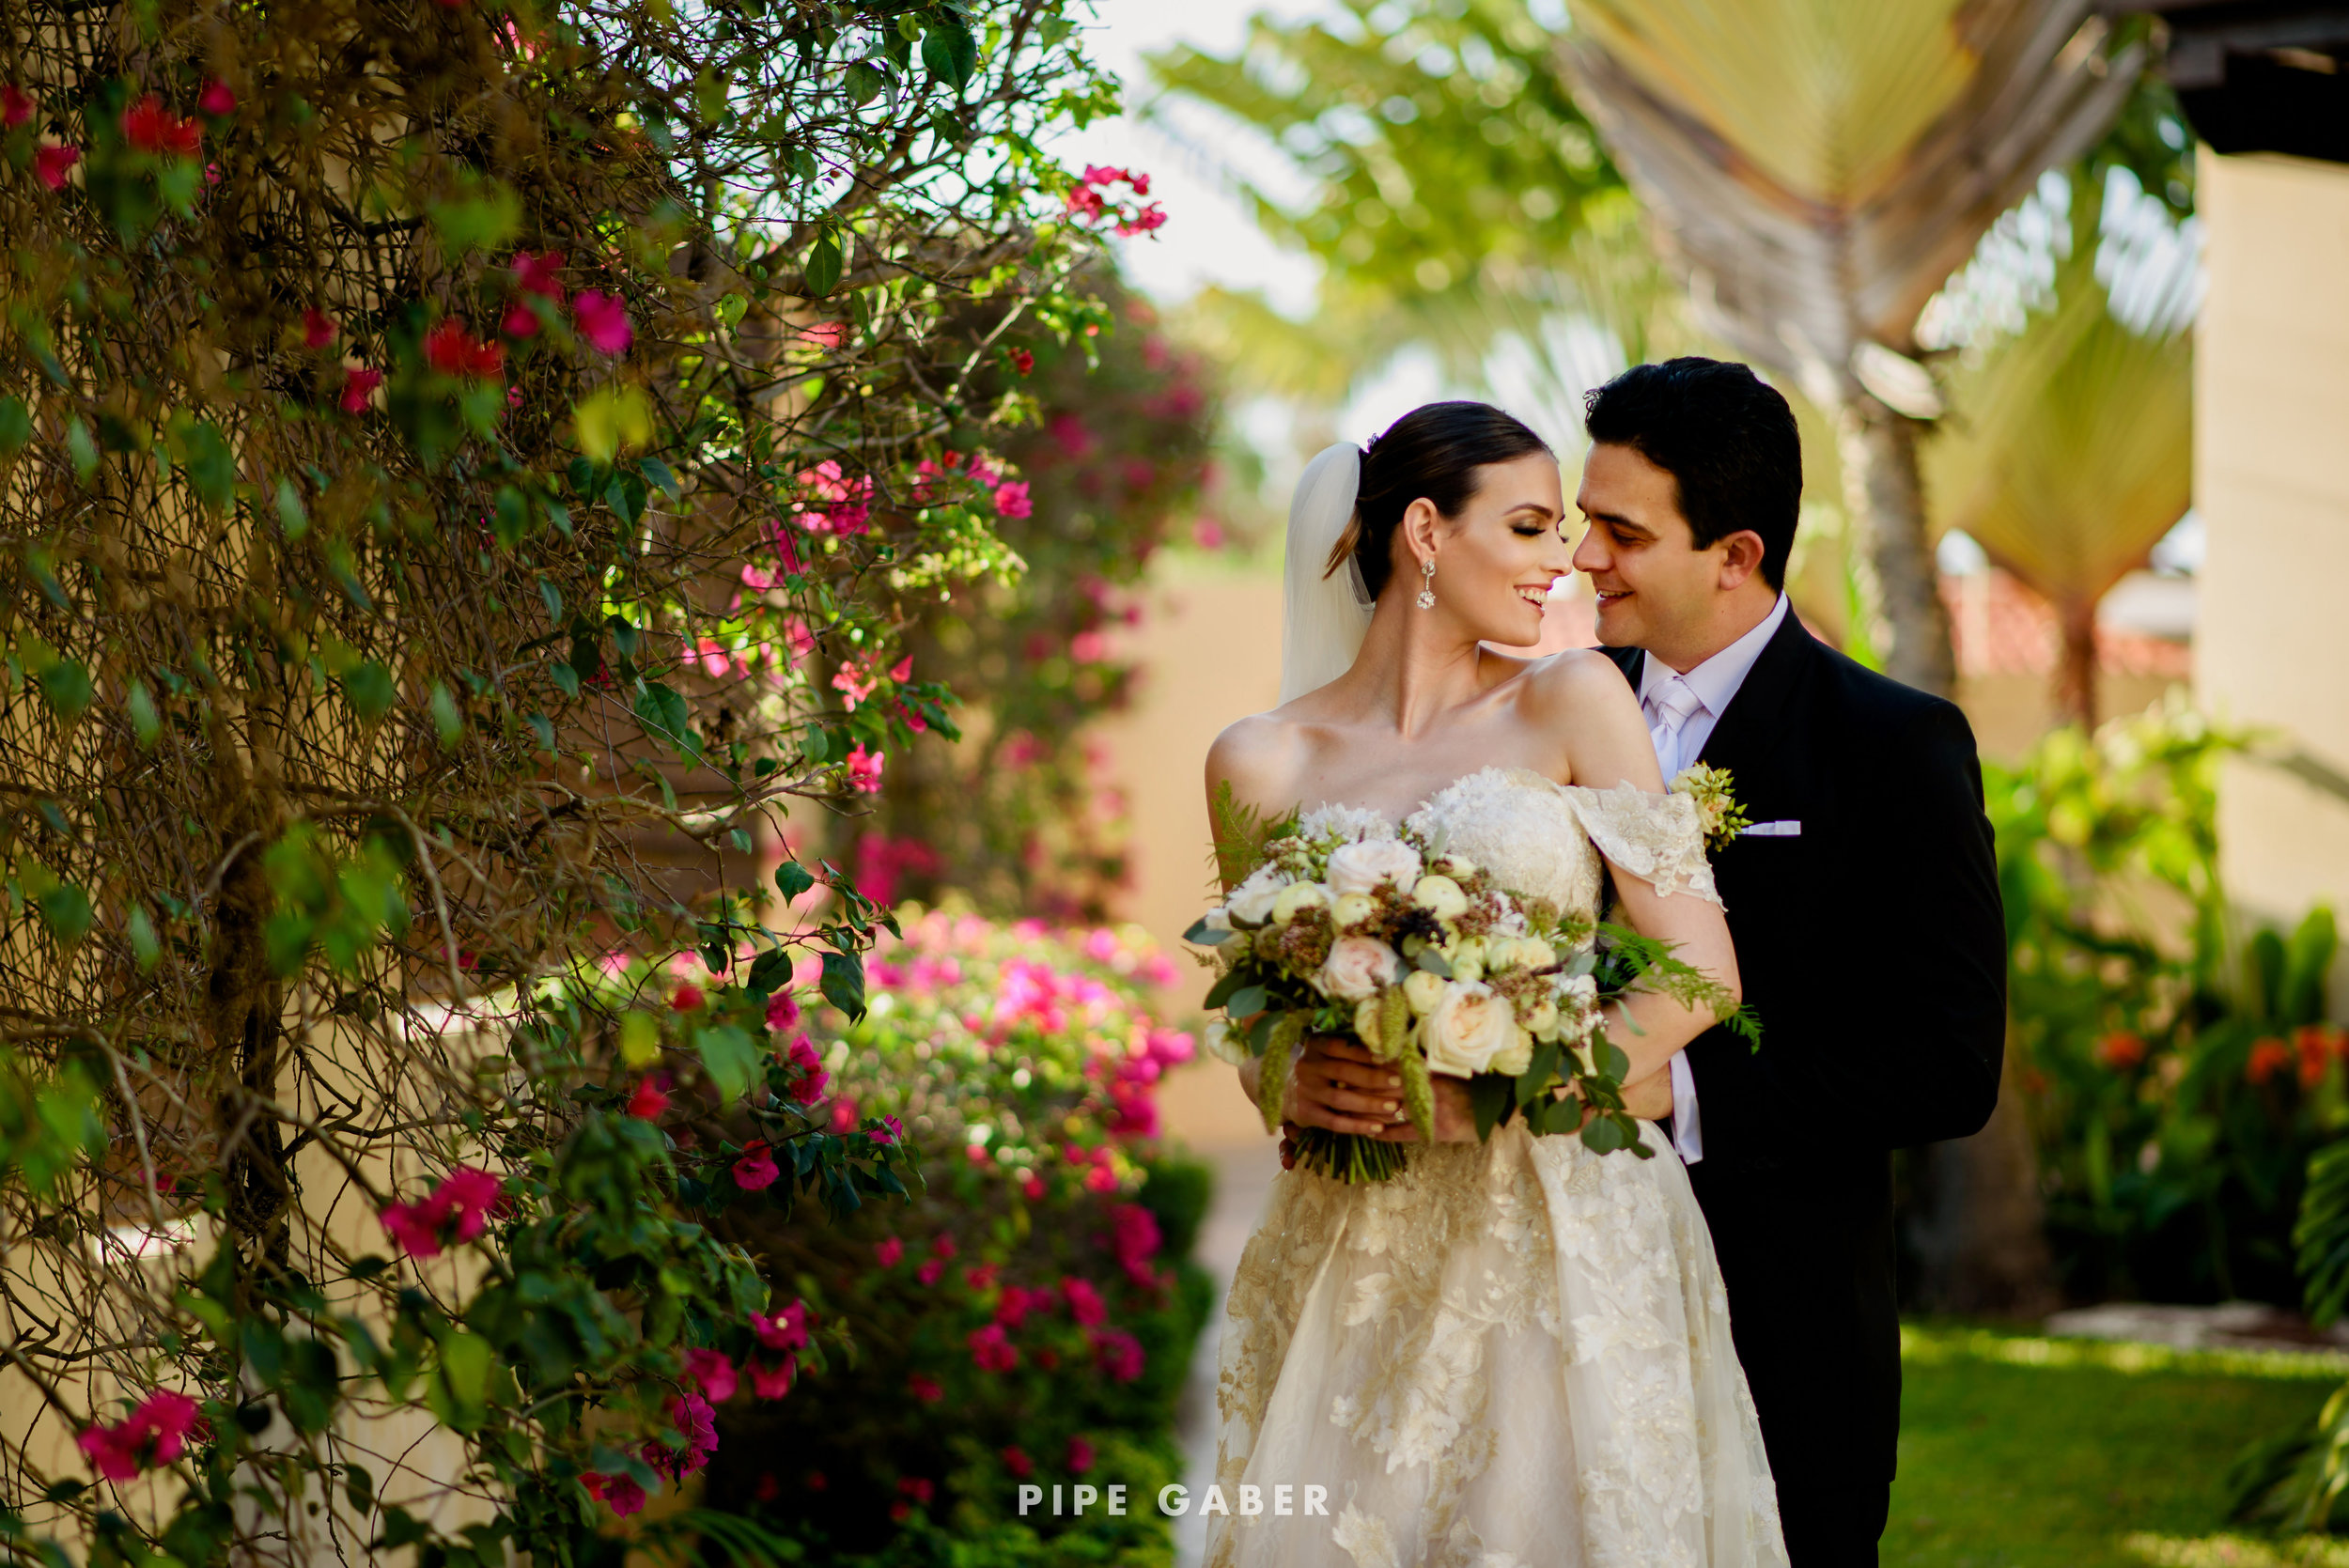 18_02_03_WEDDING_ALEXIS_ABIMERHI_ERICK_APT_0489.jpg